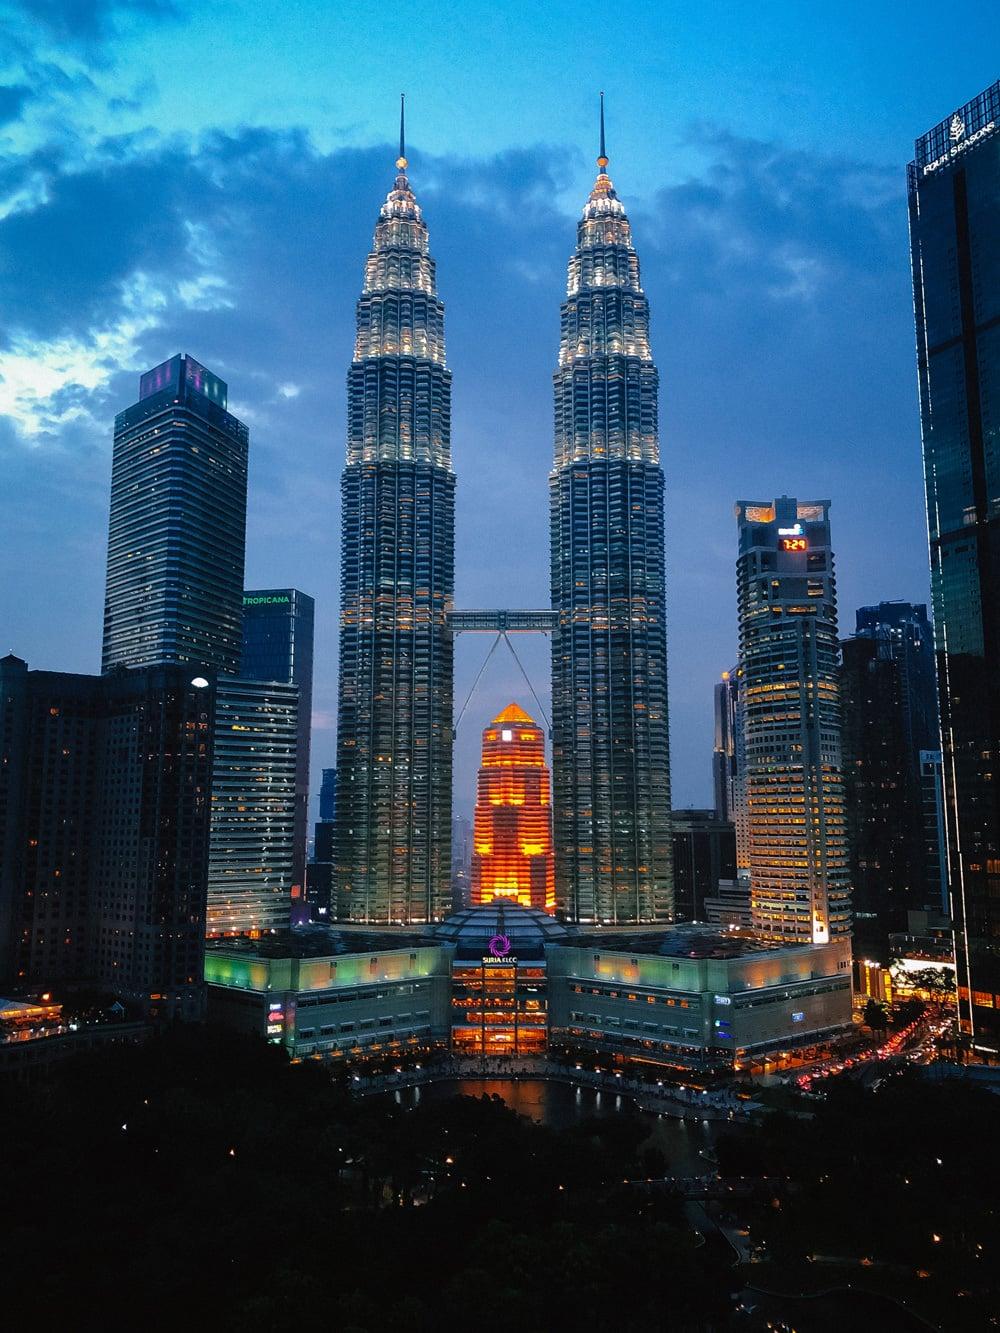 Die berühmten Petronas Towers in Kuala Lumpur, Foto: Ismael Bashiri / Unsplash